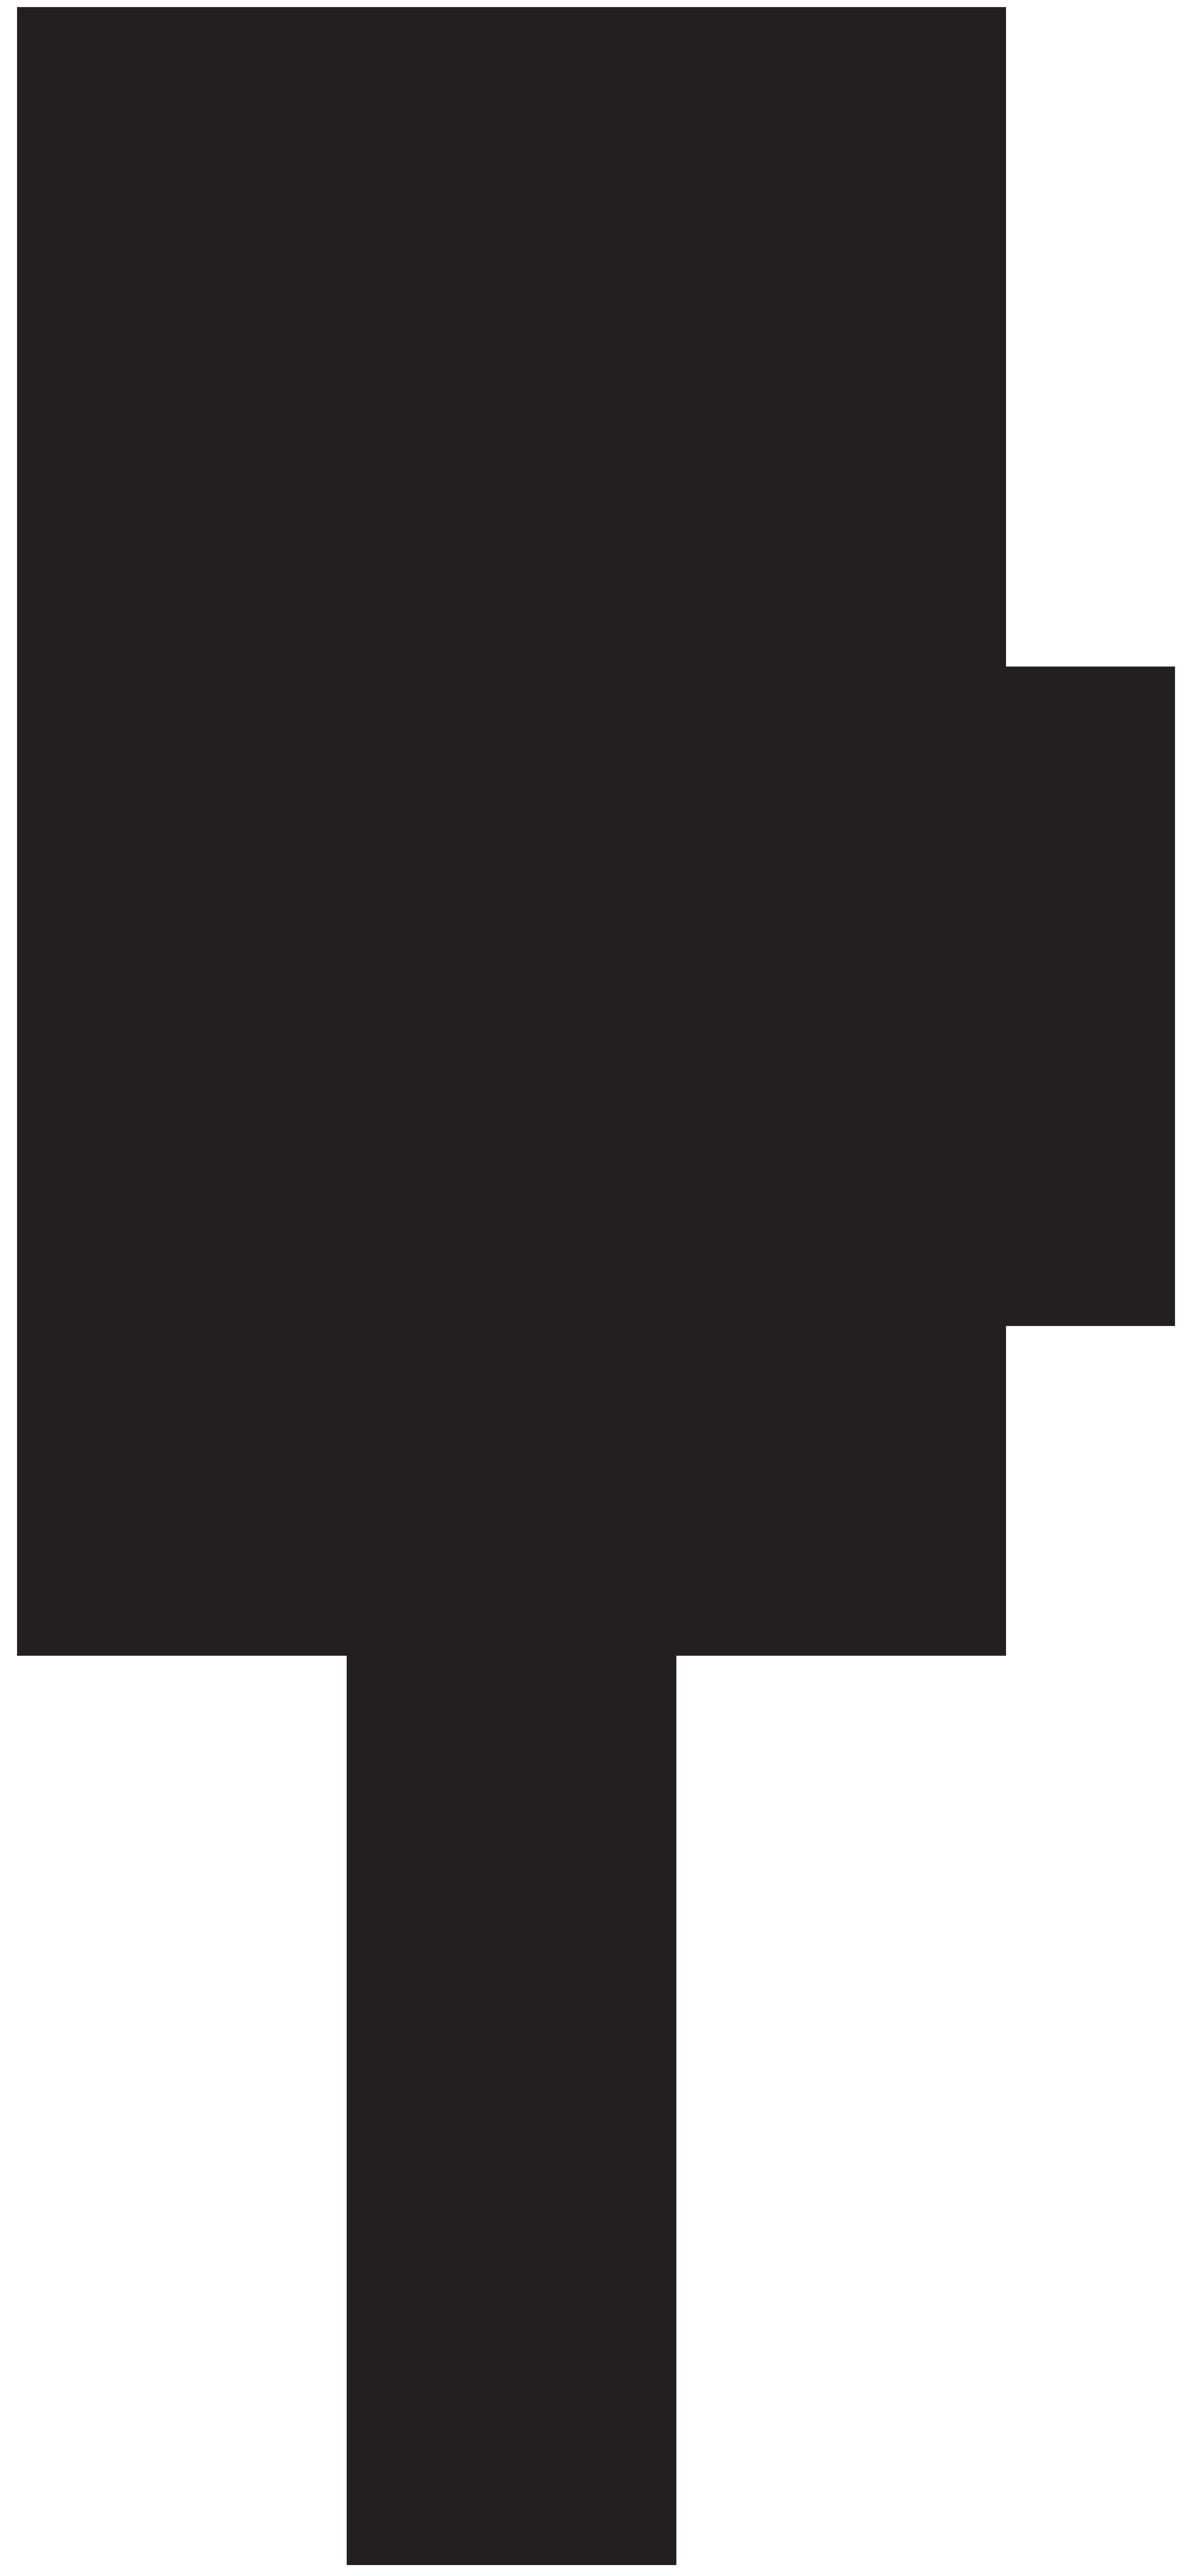 Silhouette Woman Clip art.